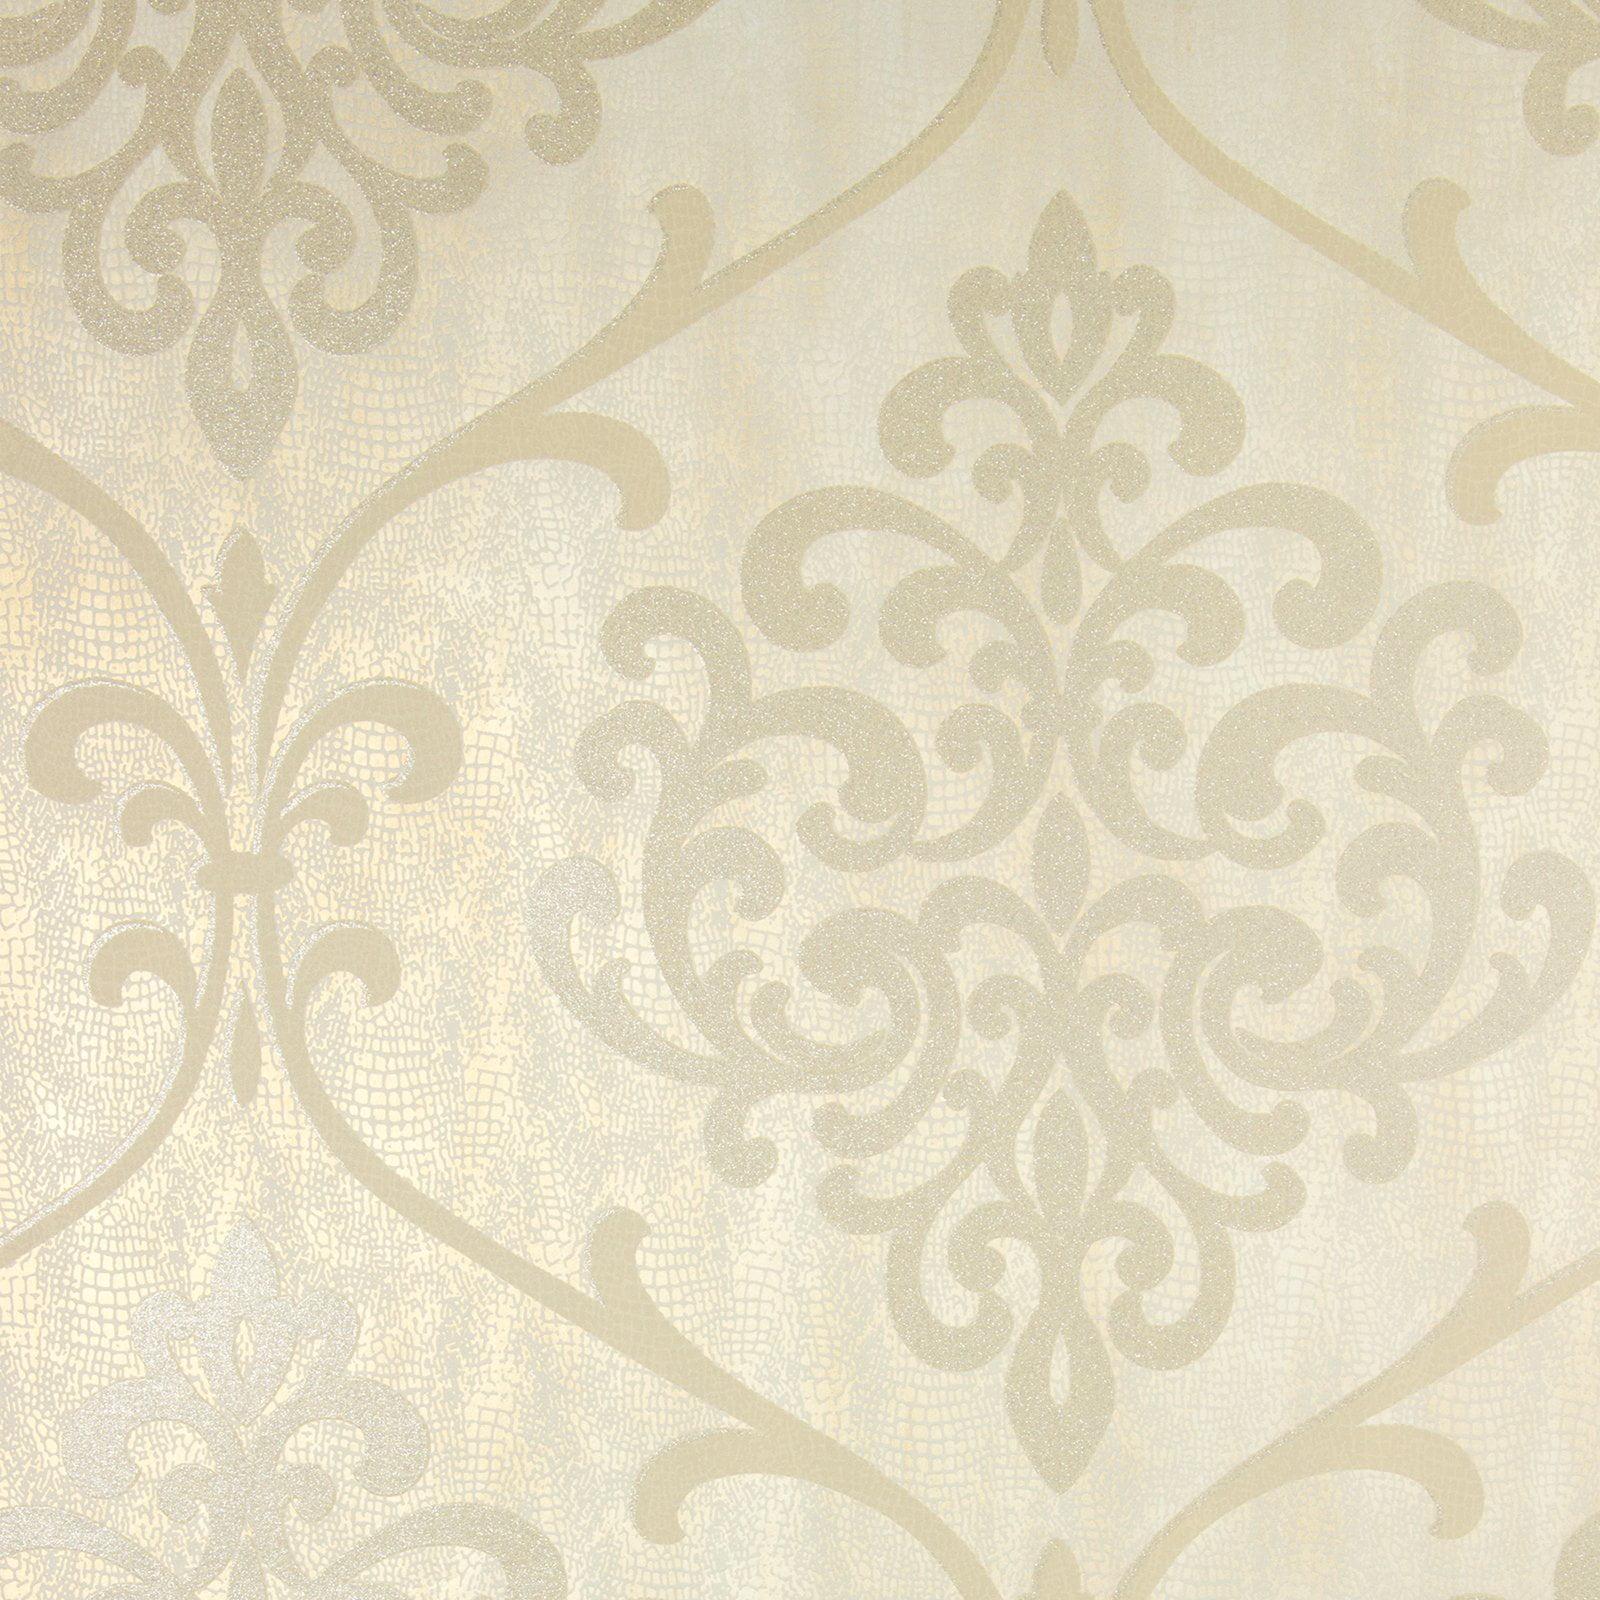 Kenneth James Ambrosia Glitter Damask Wallpaper